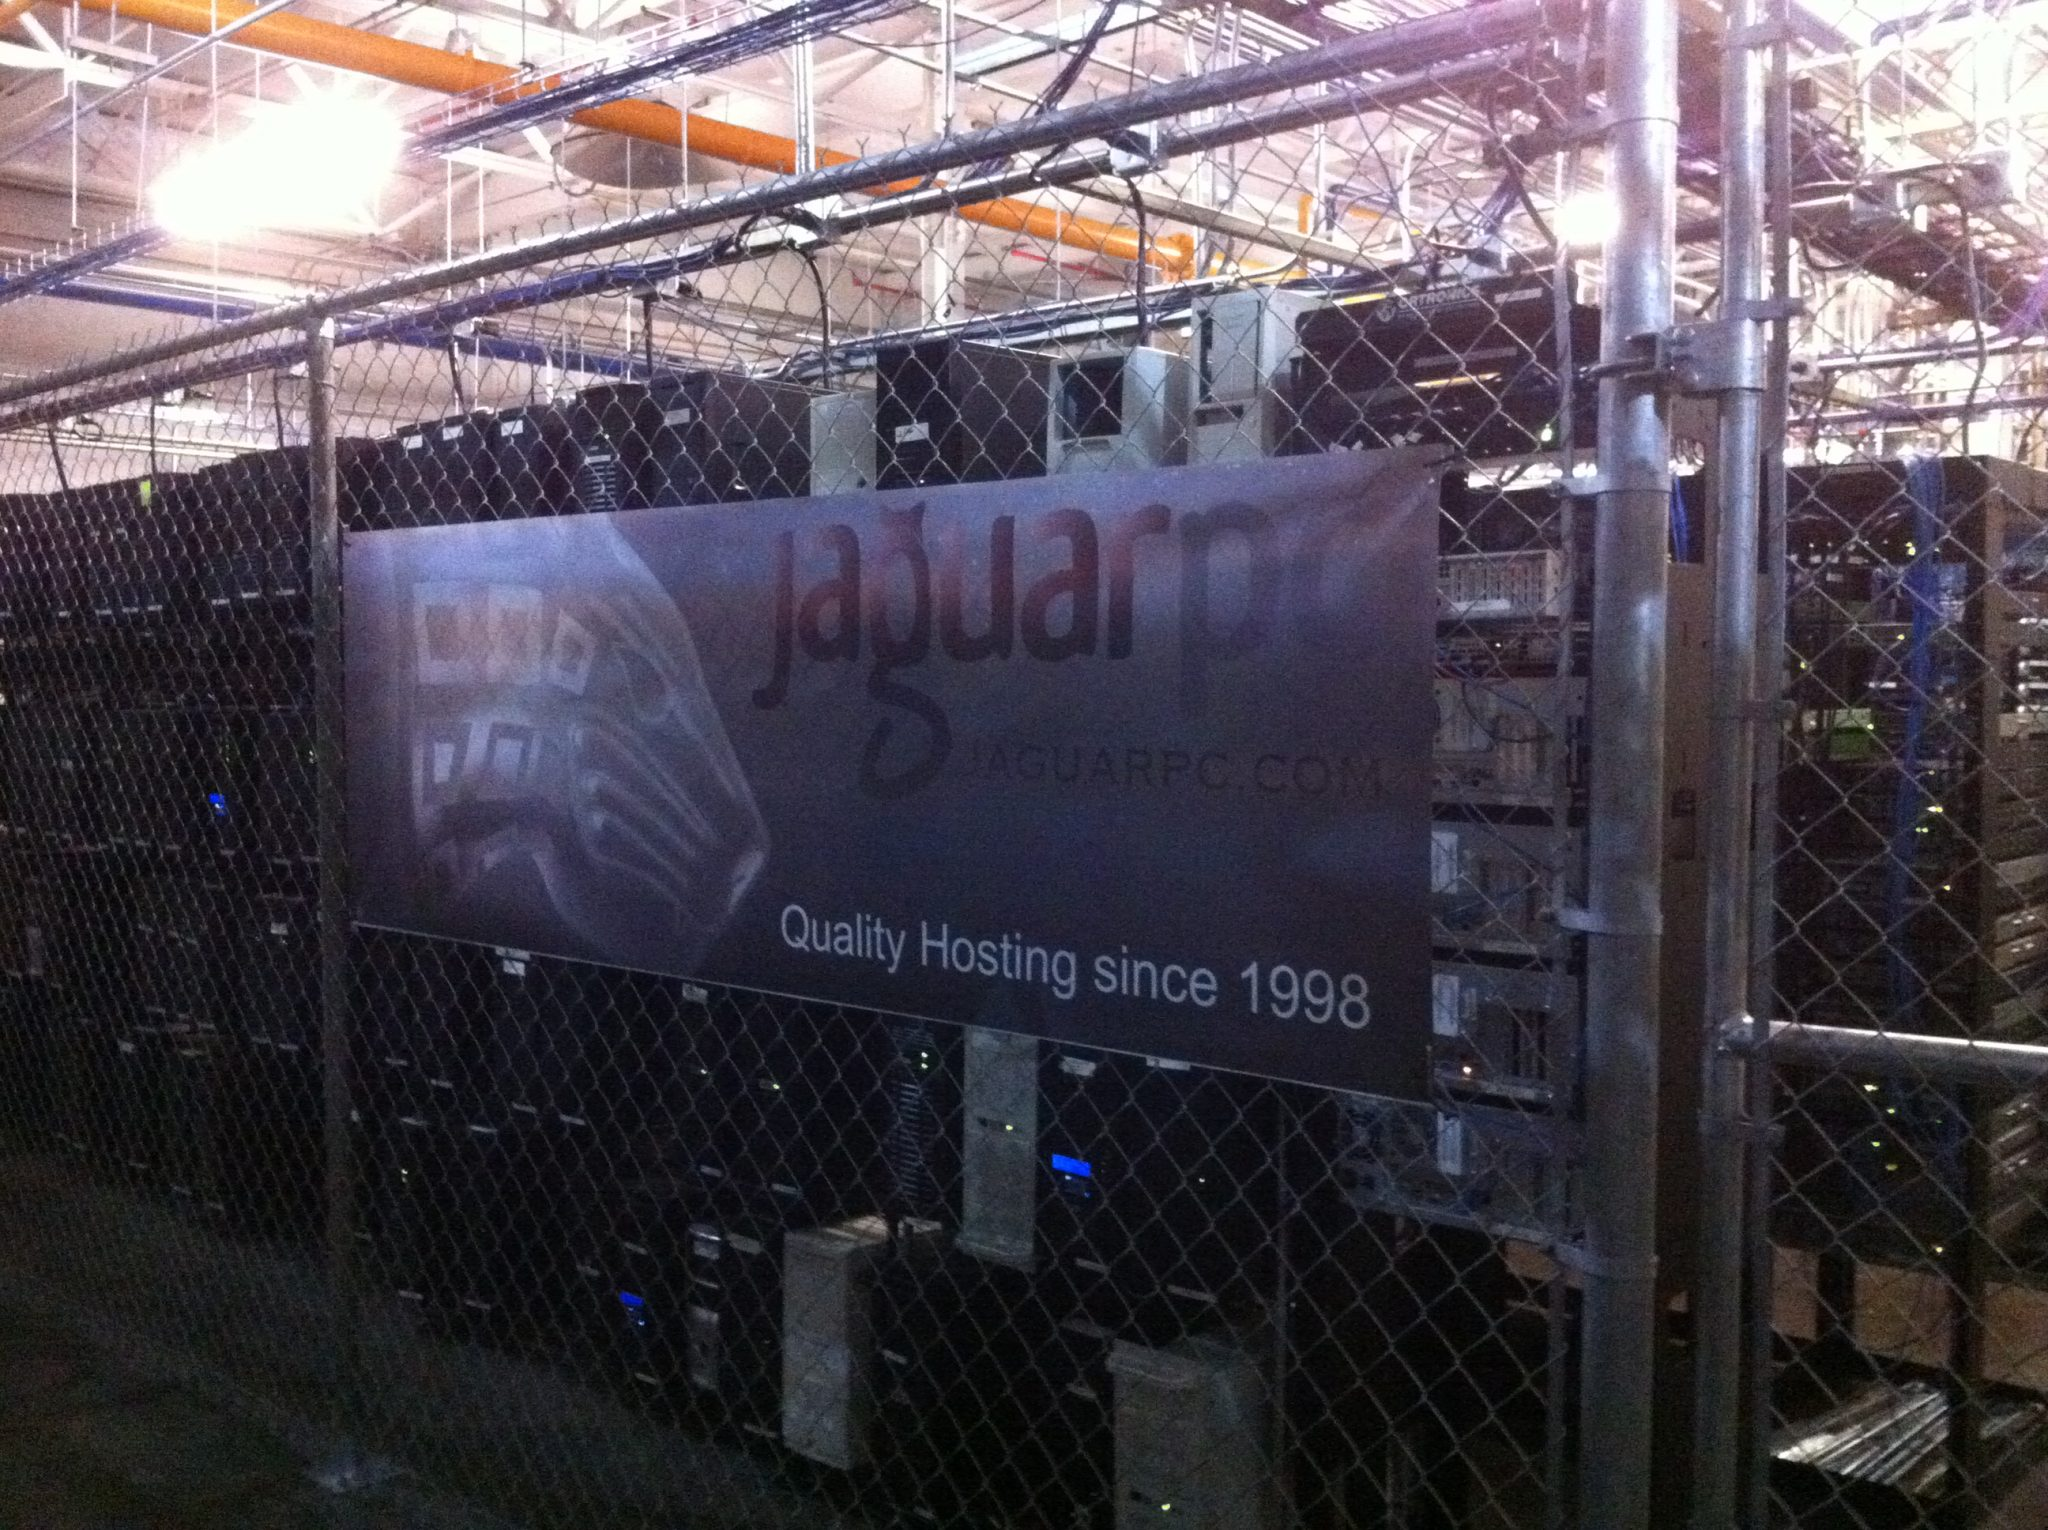 JaguarPC Data Center Server Cage